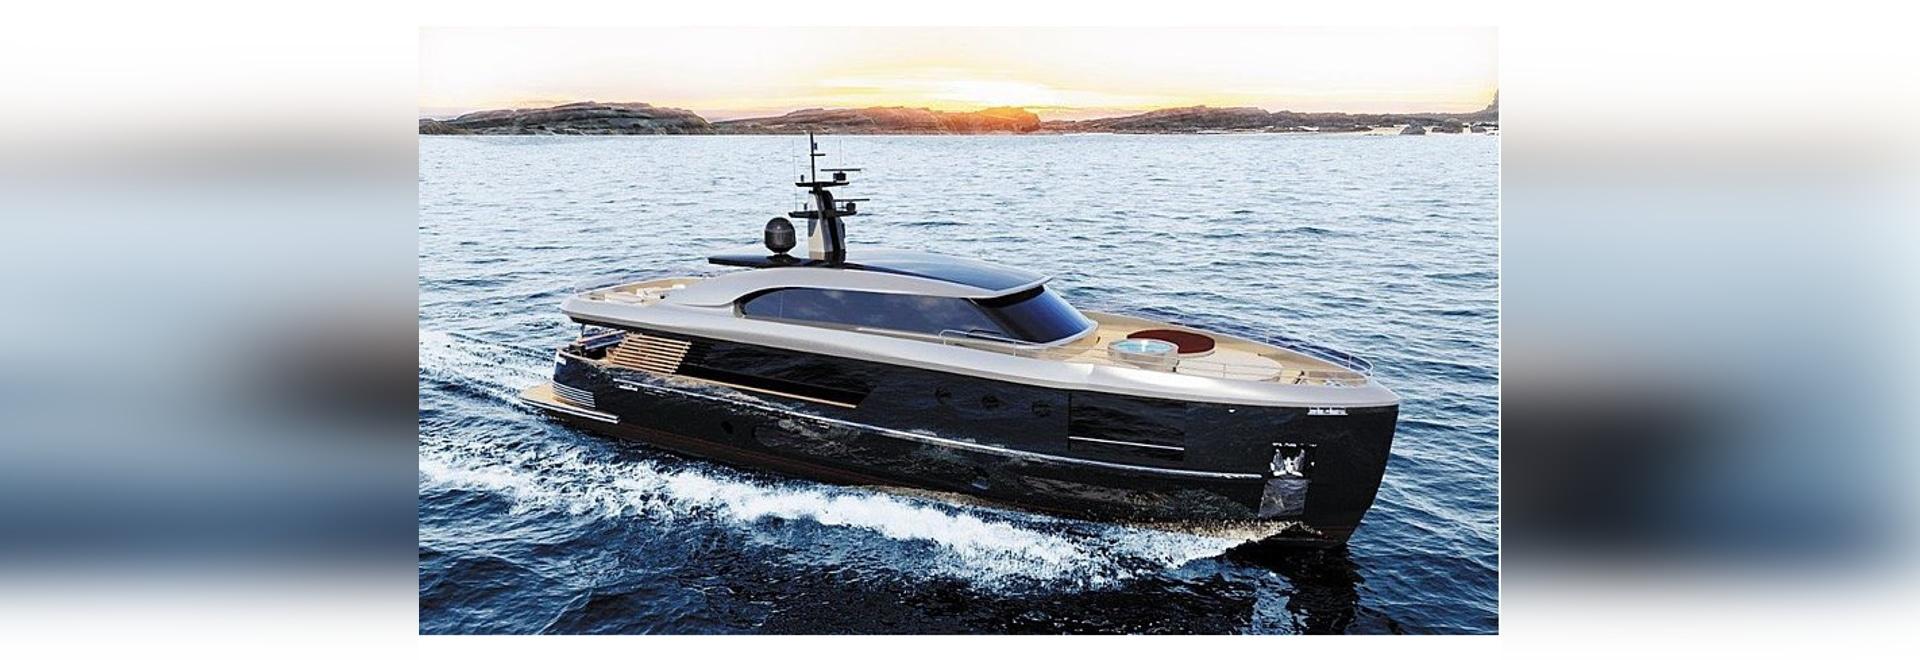 Azimut entwickelt neues Flaggschiff Magellano 30